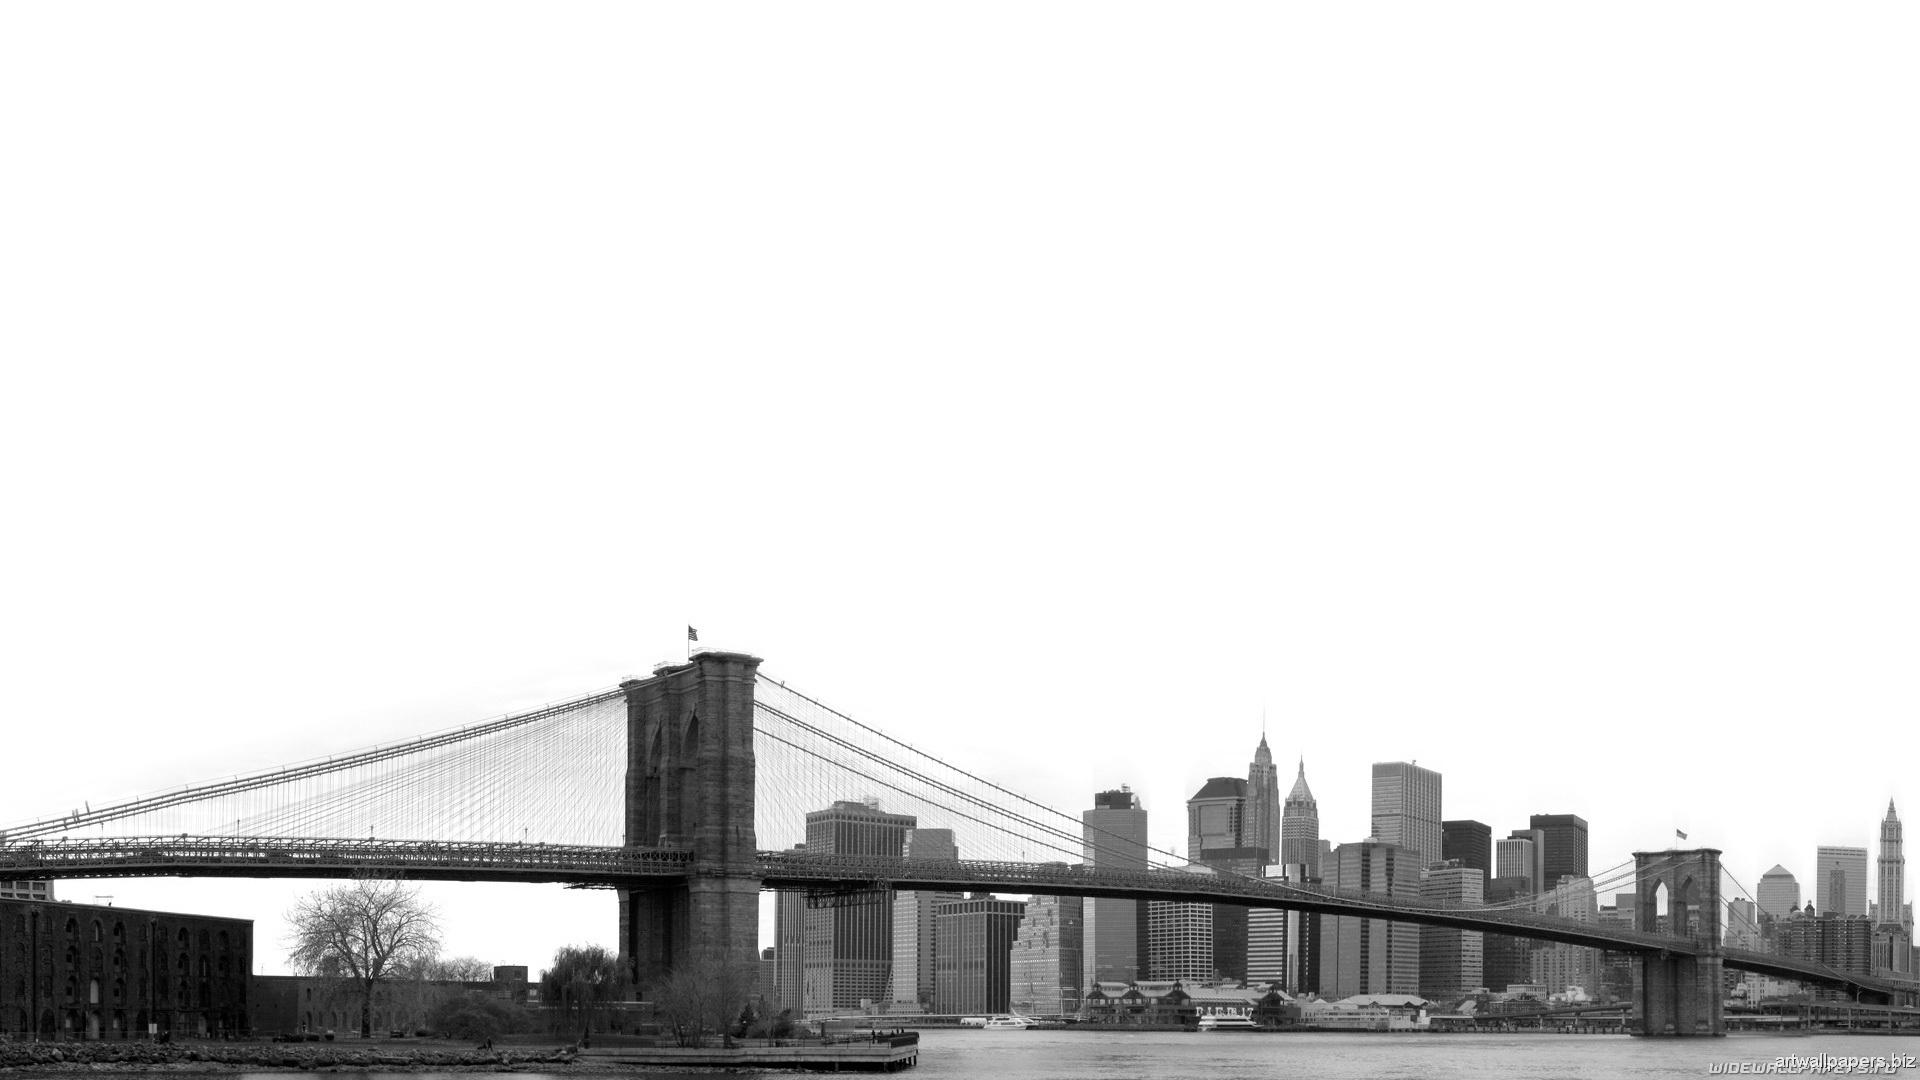 Architecture Cities Full Hd 439975 Wallpaper wallpaper